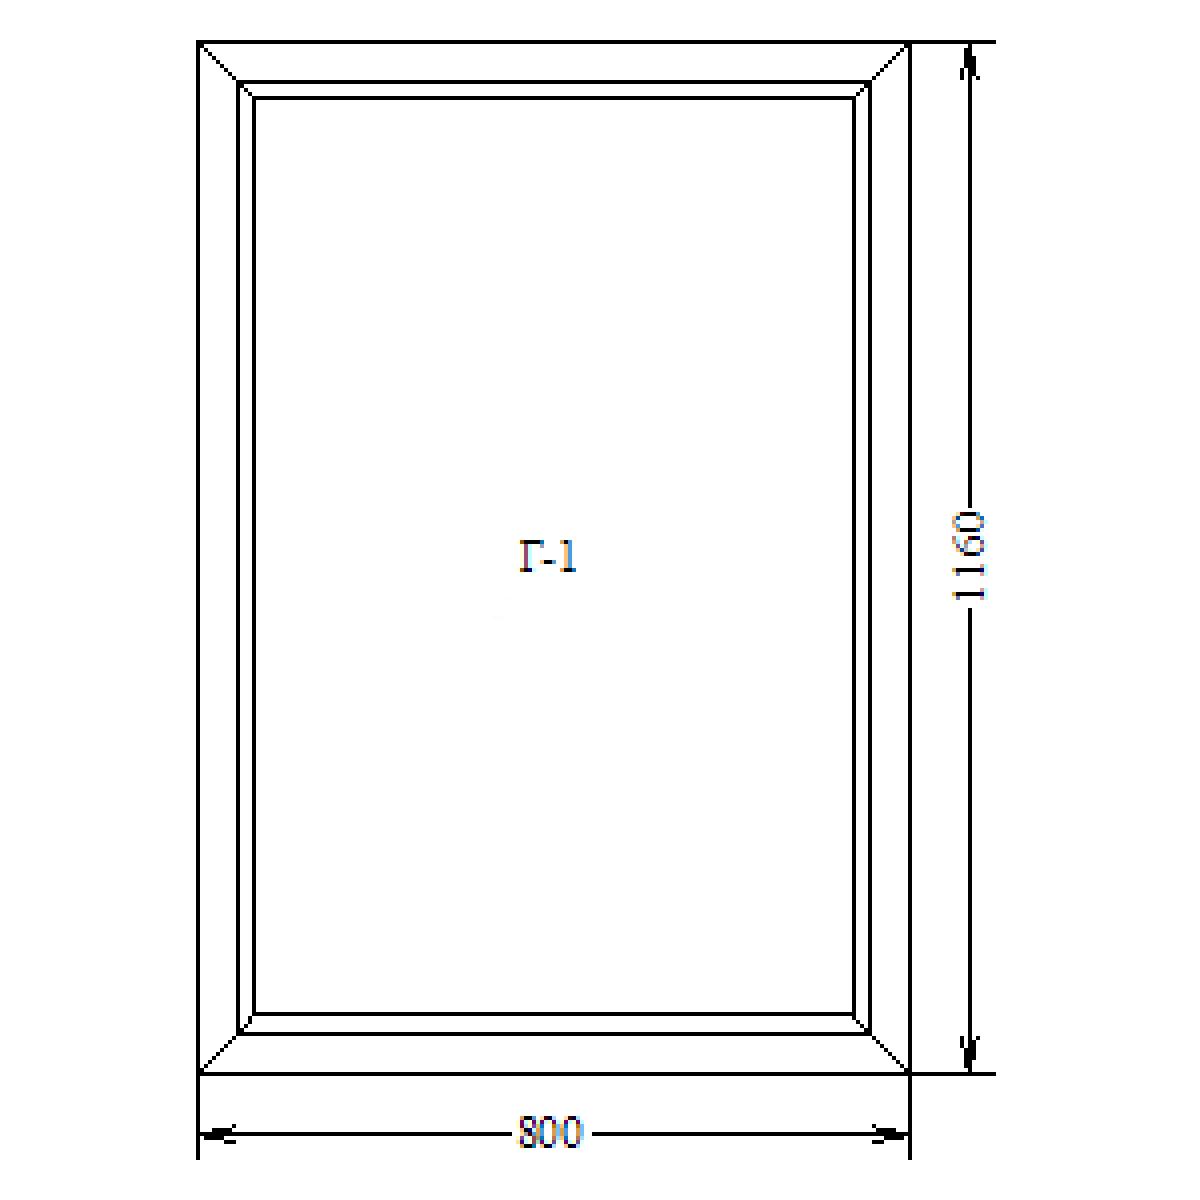 gealan-s9000-siegenia-titan-af-800x1160-glukhoe-163_XL